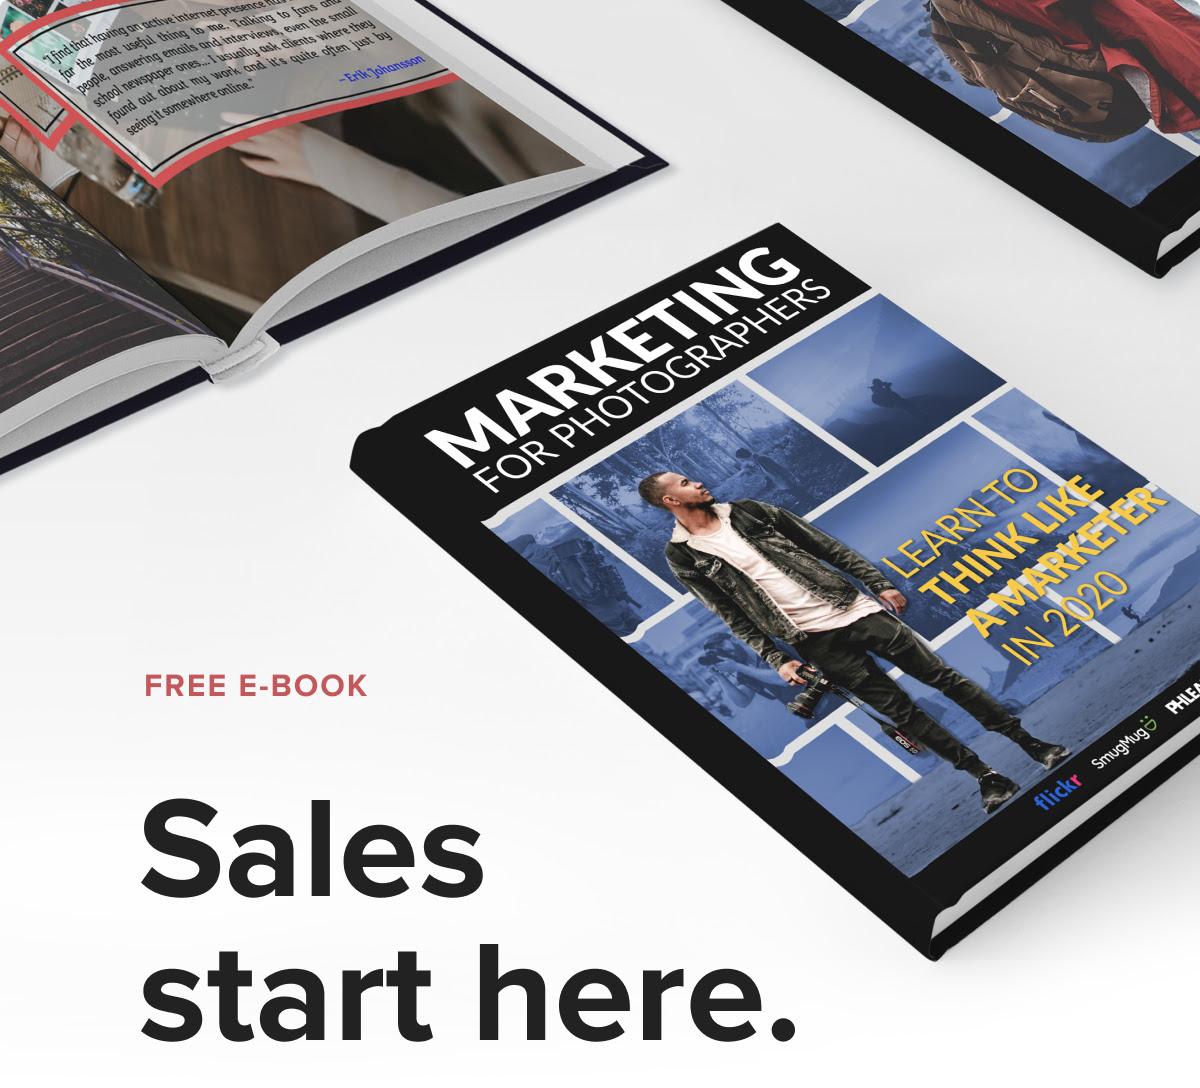 Sales start here.